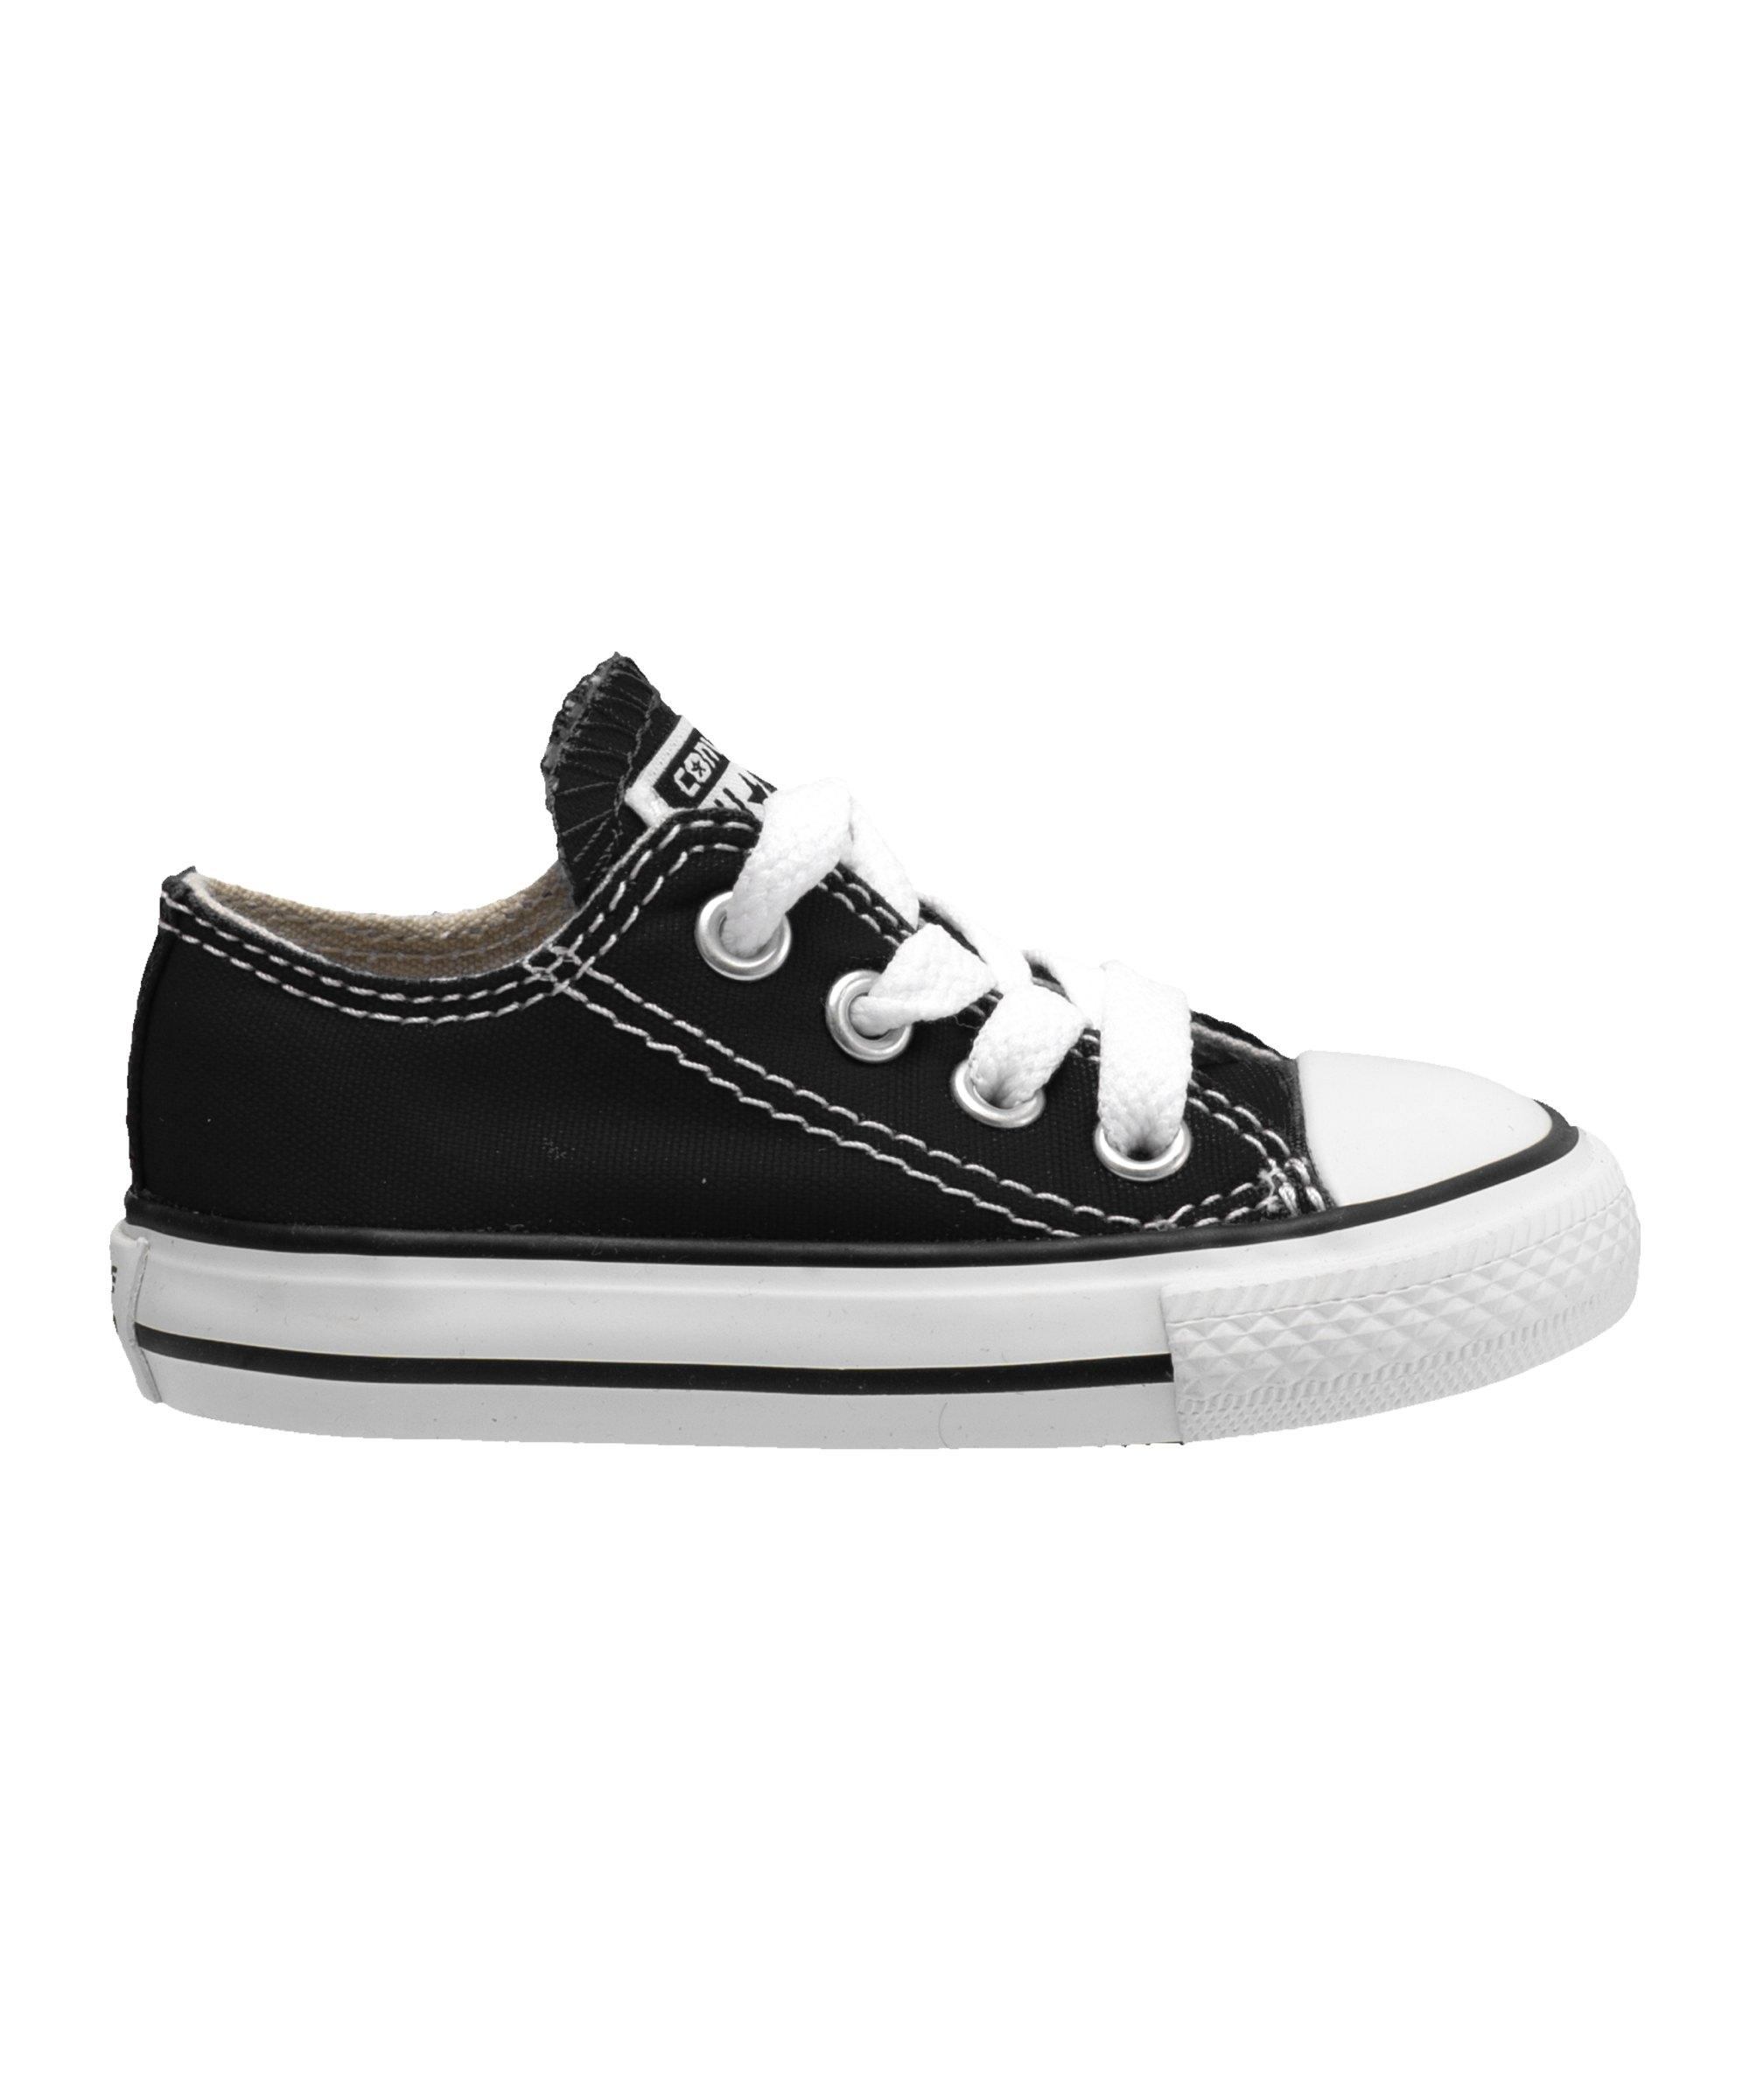 Converse Chuck Taylor AS OX Sneaker Kids Schwarz - Schwarz